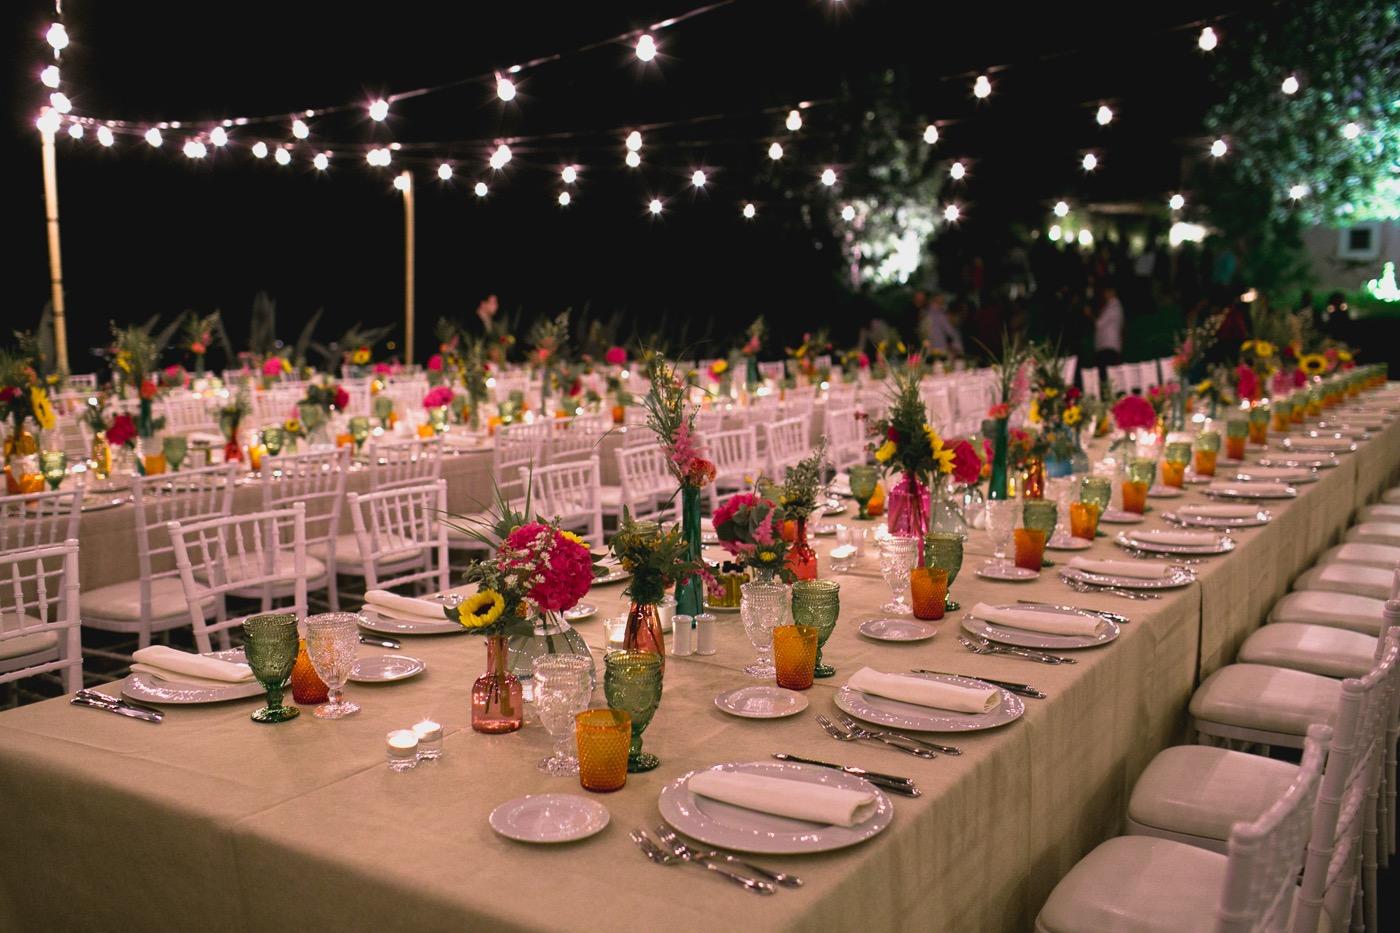 Si-Quiero-Wedding-Planner-By-Sira-Antequera-Bodas-Málaga-Marbella-Miami- PATRICIA-JUANLU-5